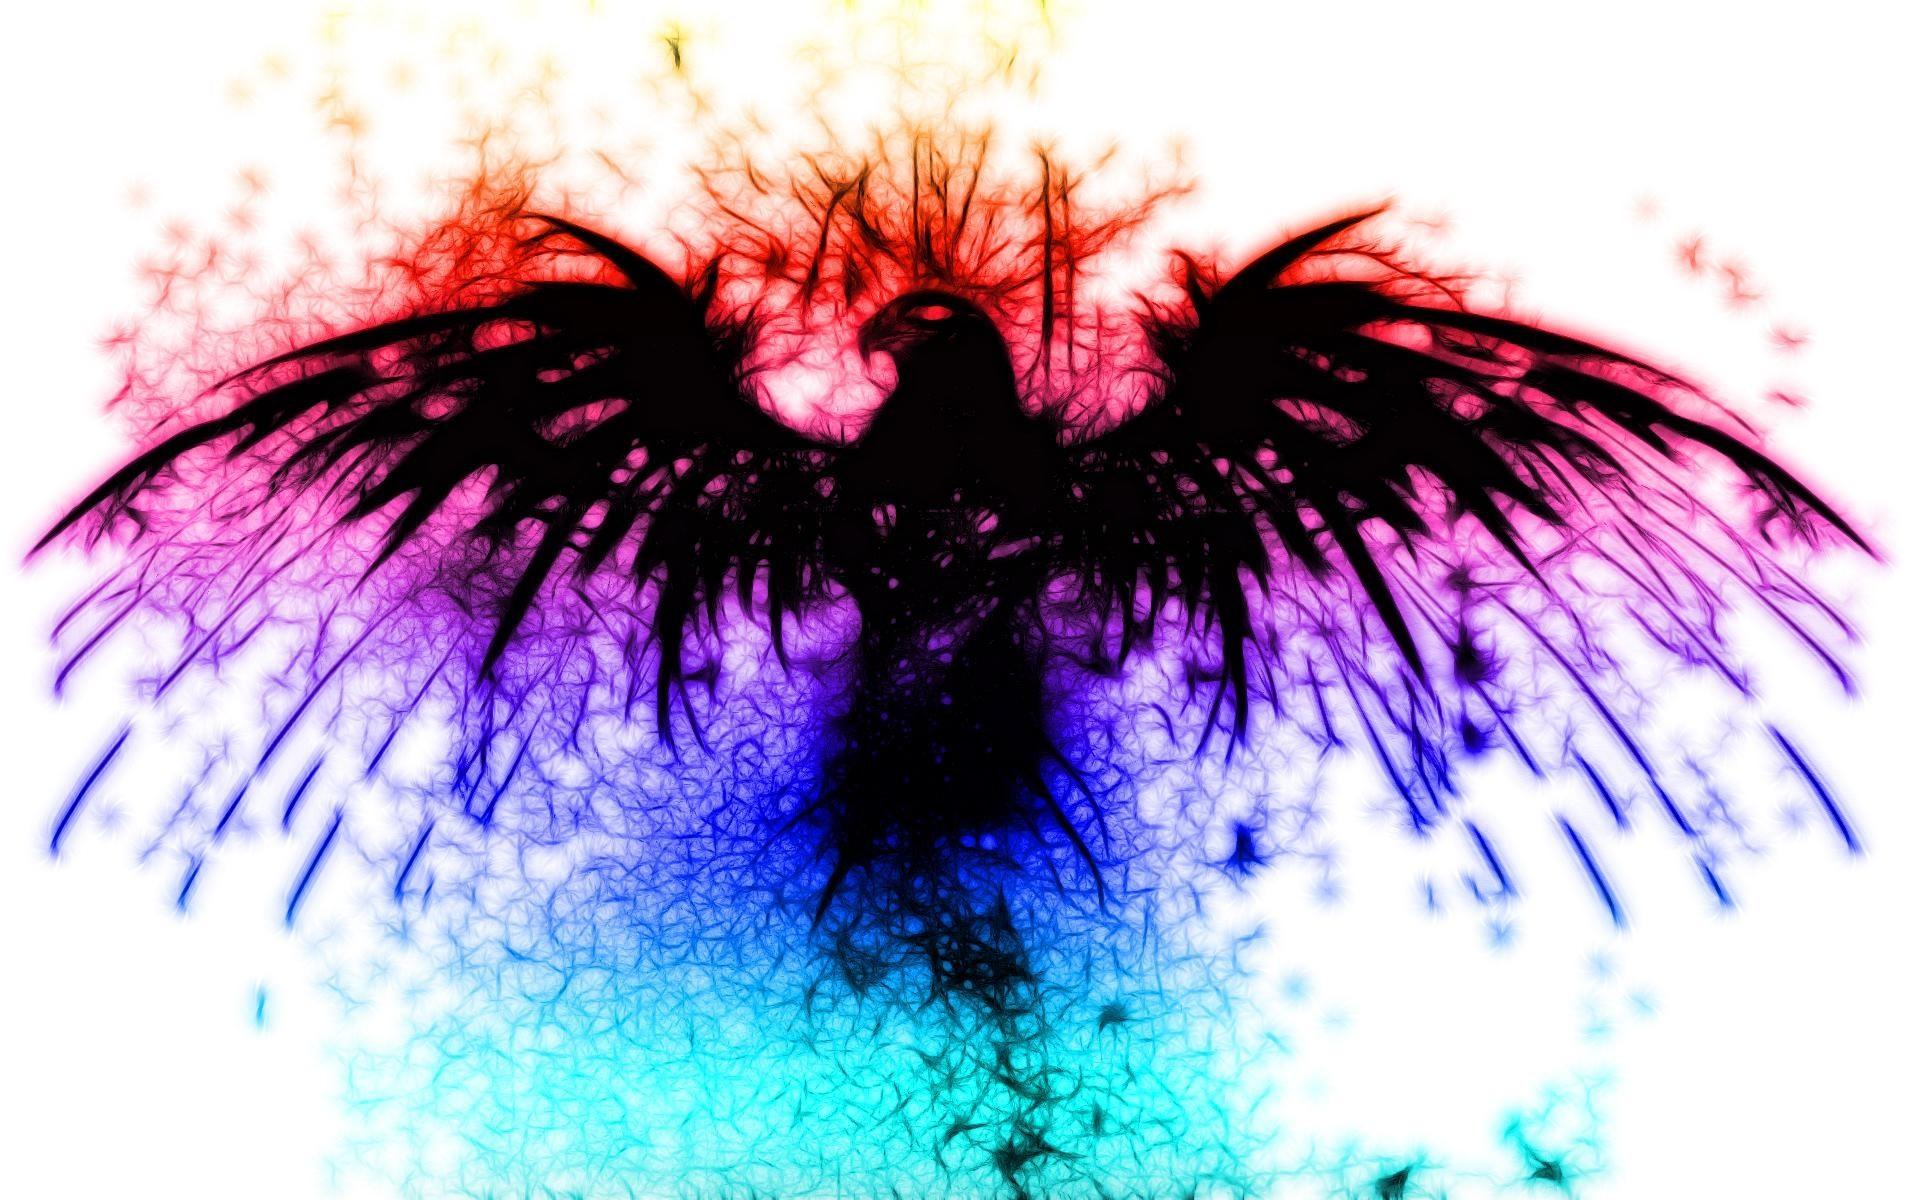 BW Eagle wallpaper u wallpaper free download 1600×1200 Desert eagle hd  wallpaper   Adorable Wallpapers   Desktop   Pinterest   Desert eagle,  Wallpaper and …